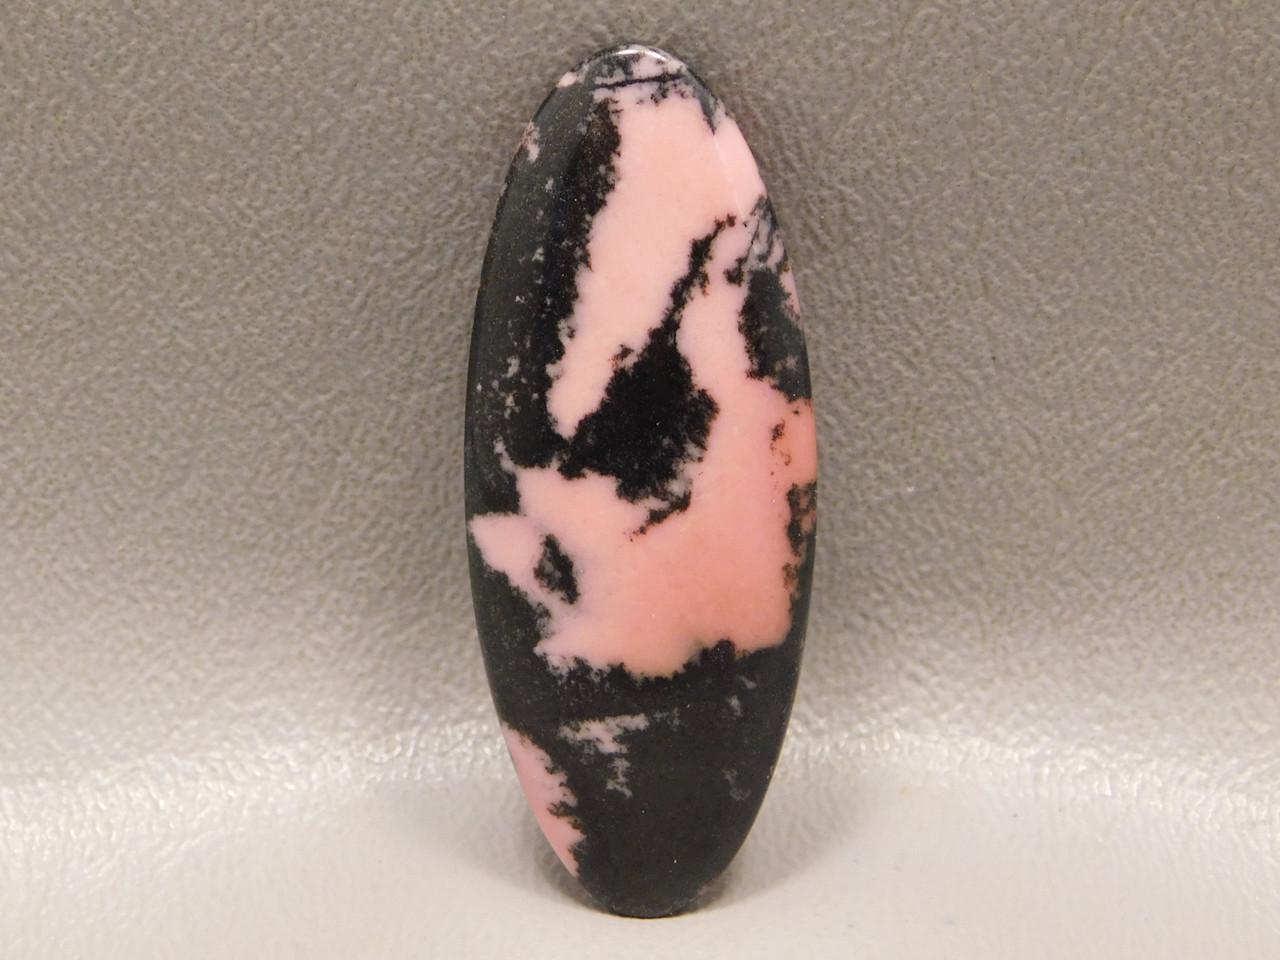 Cabochon Jewelry Loose Stone Rhodonite Pink Oval Australia #16